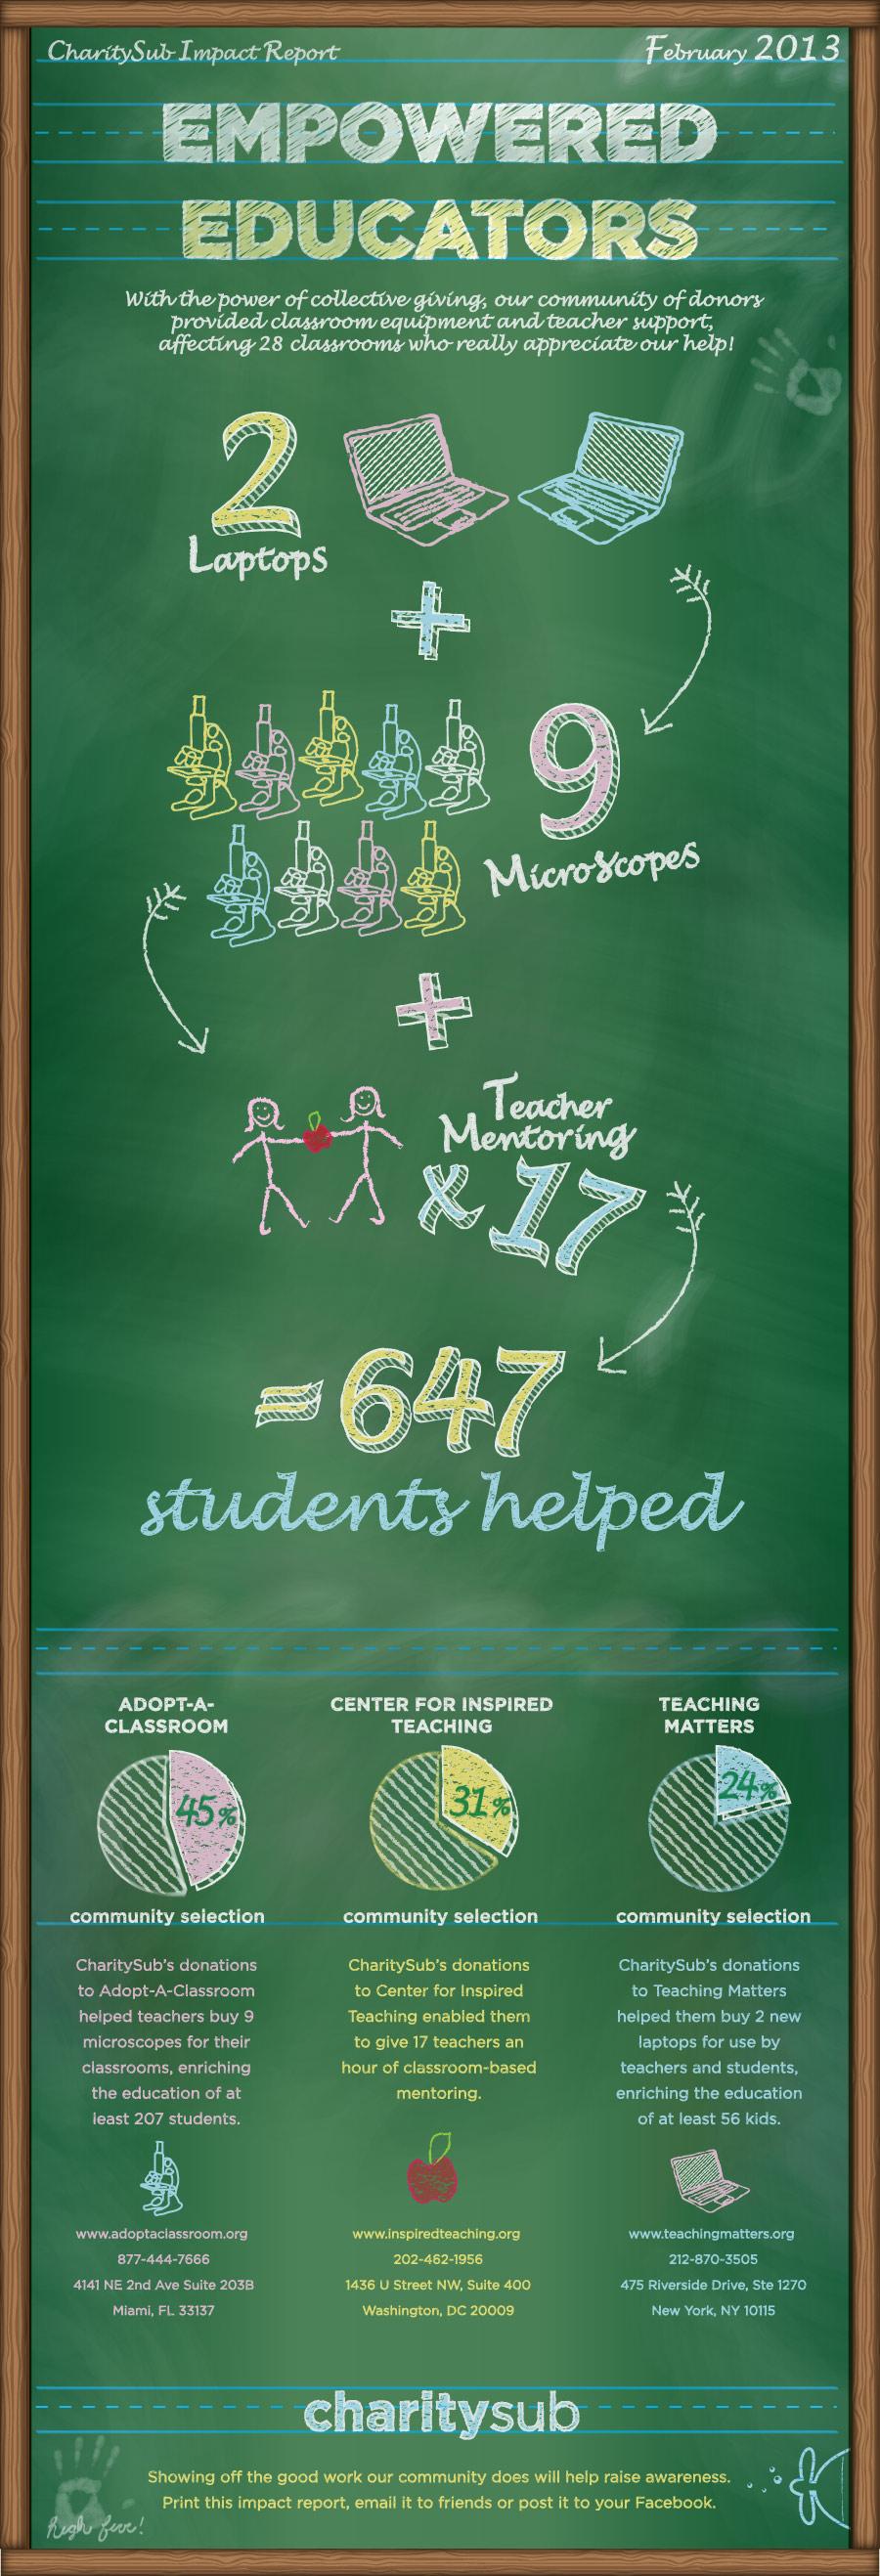 14-empowered-educators-impact-report